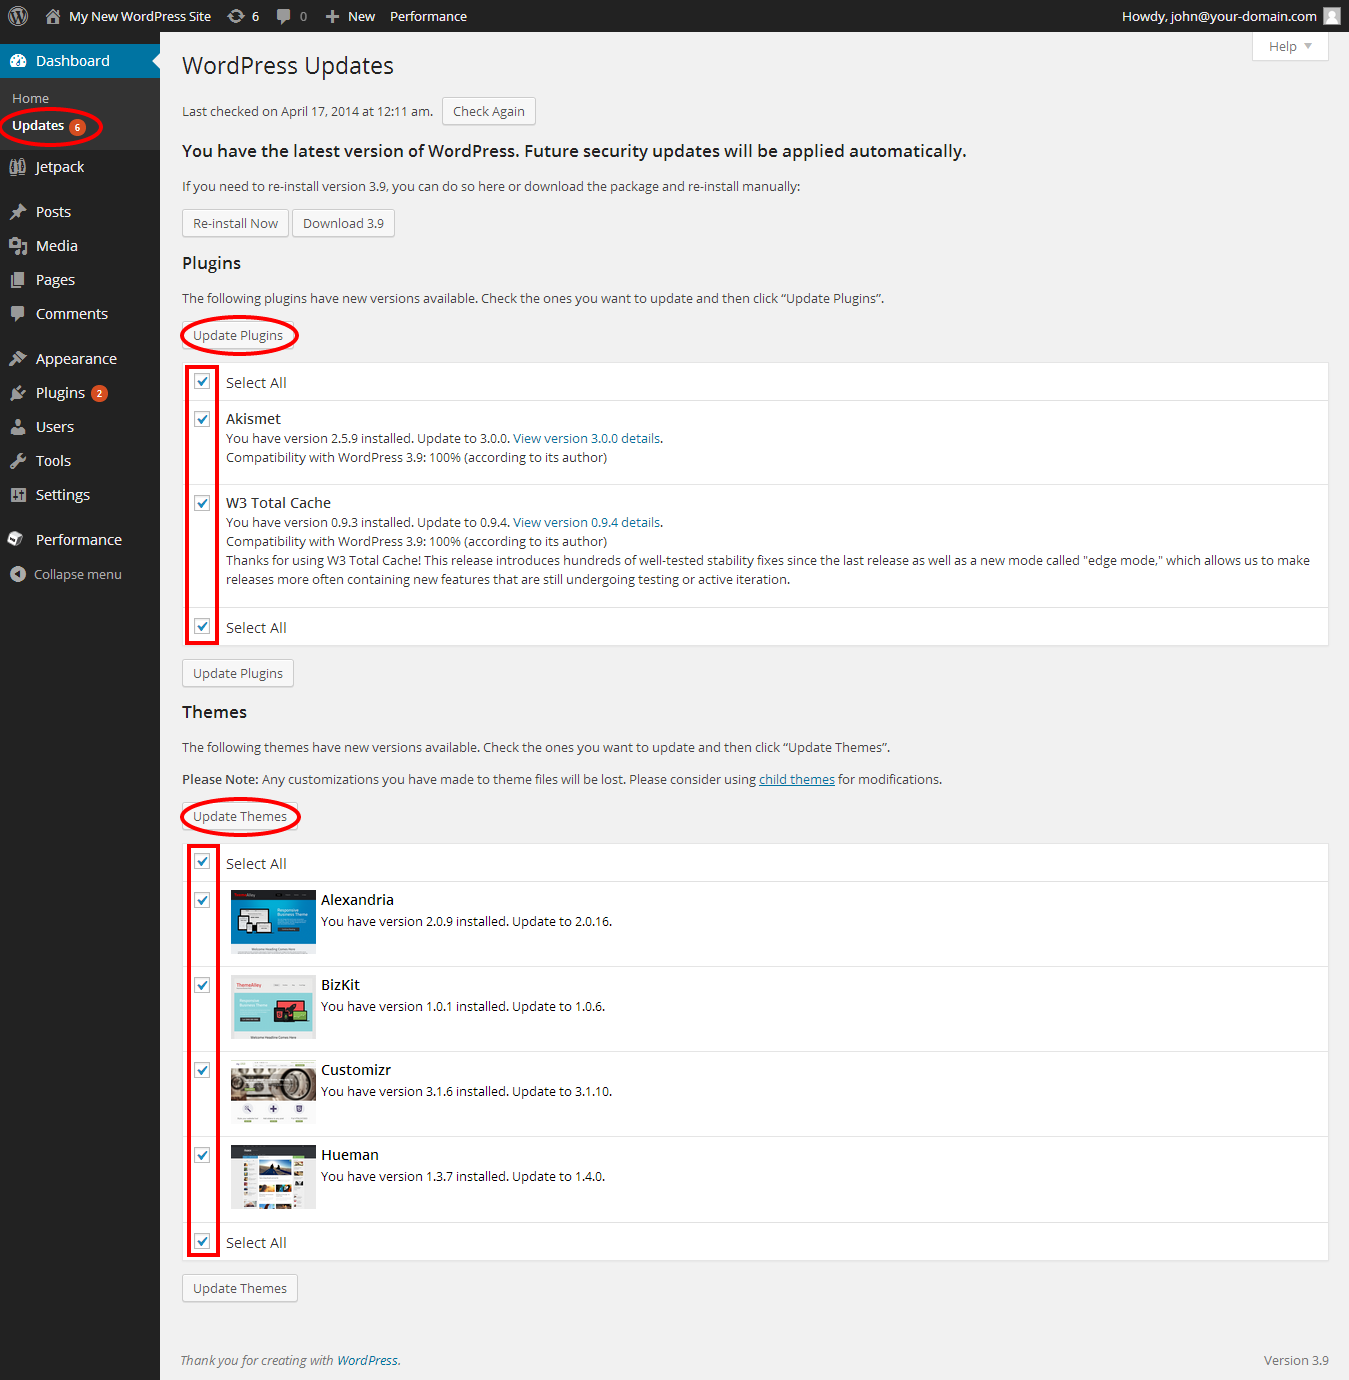 Update your WordPress theme